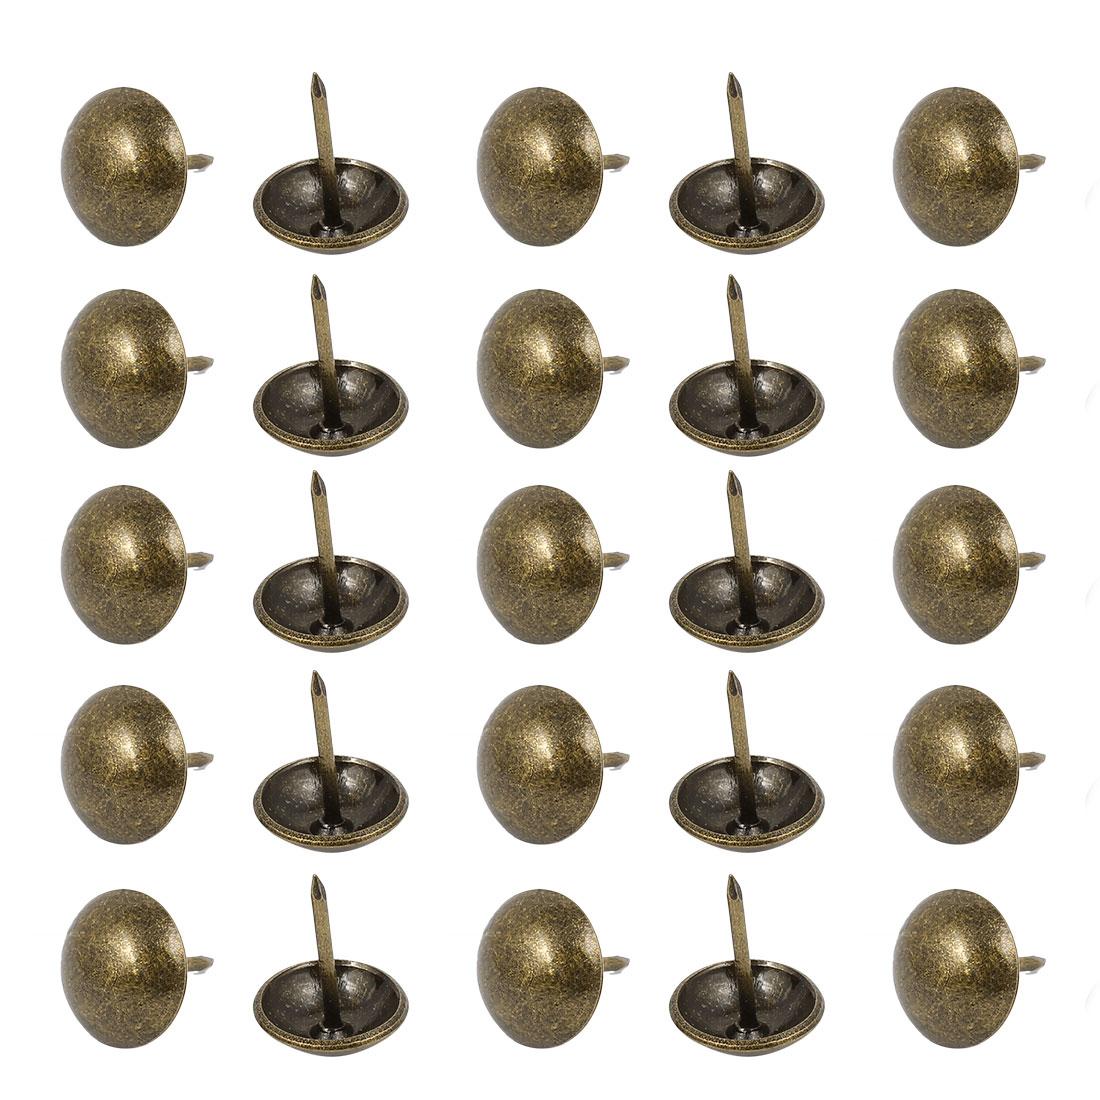 14mm Dia Metal Upholstery Nail Tack Stud Push Pin Doornail Bronze Tone 25PCS